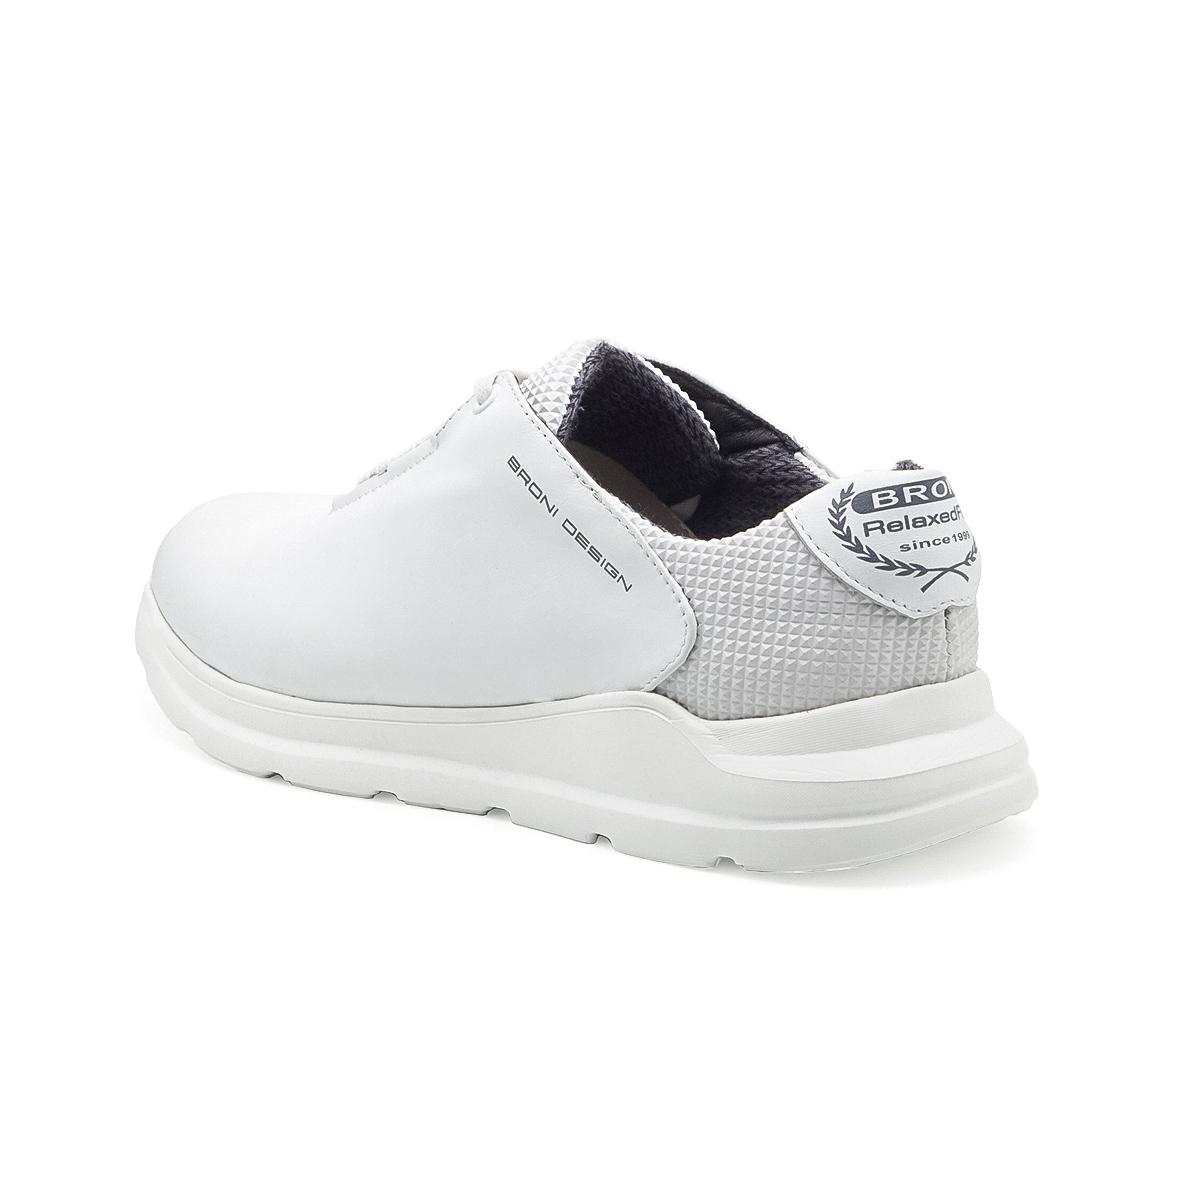 Фотография обуви для интернет-магазина LaModa